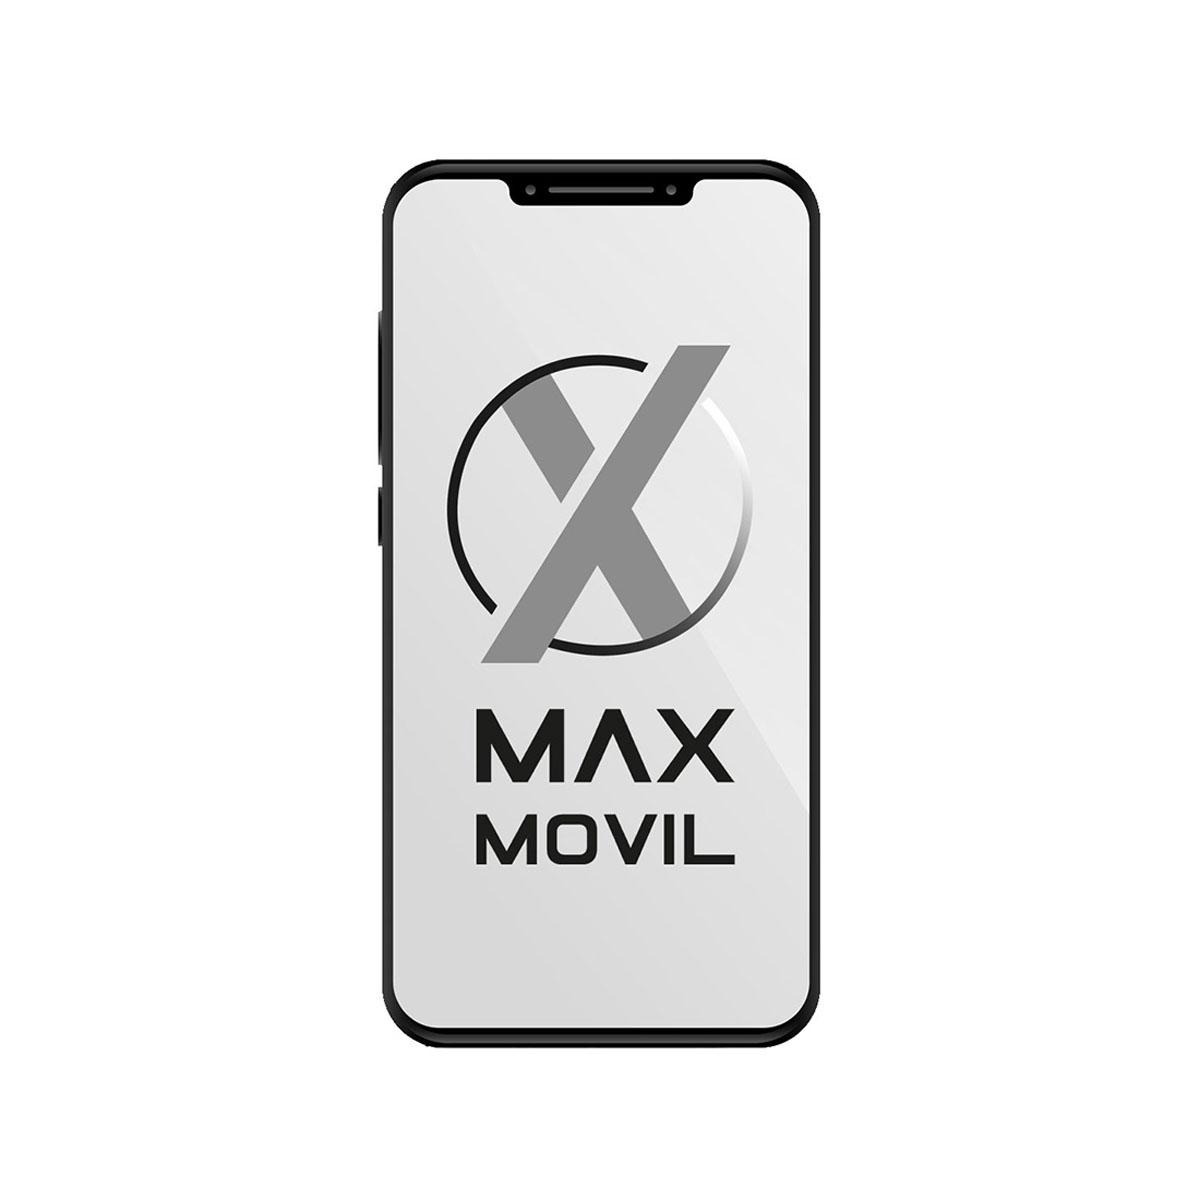 Memoria Mooster  USB 8GB TOONS hero bat mx 1307